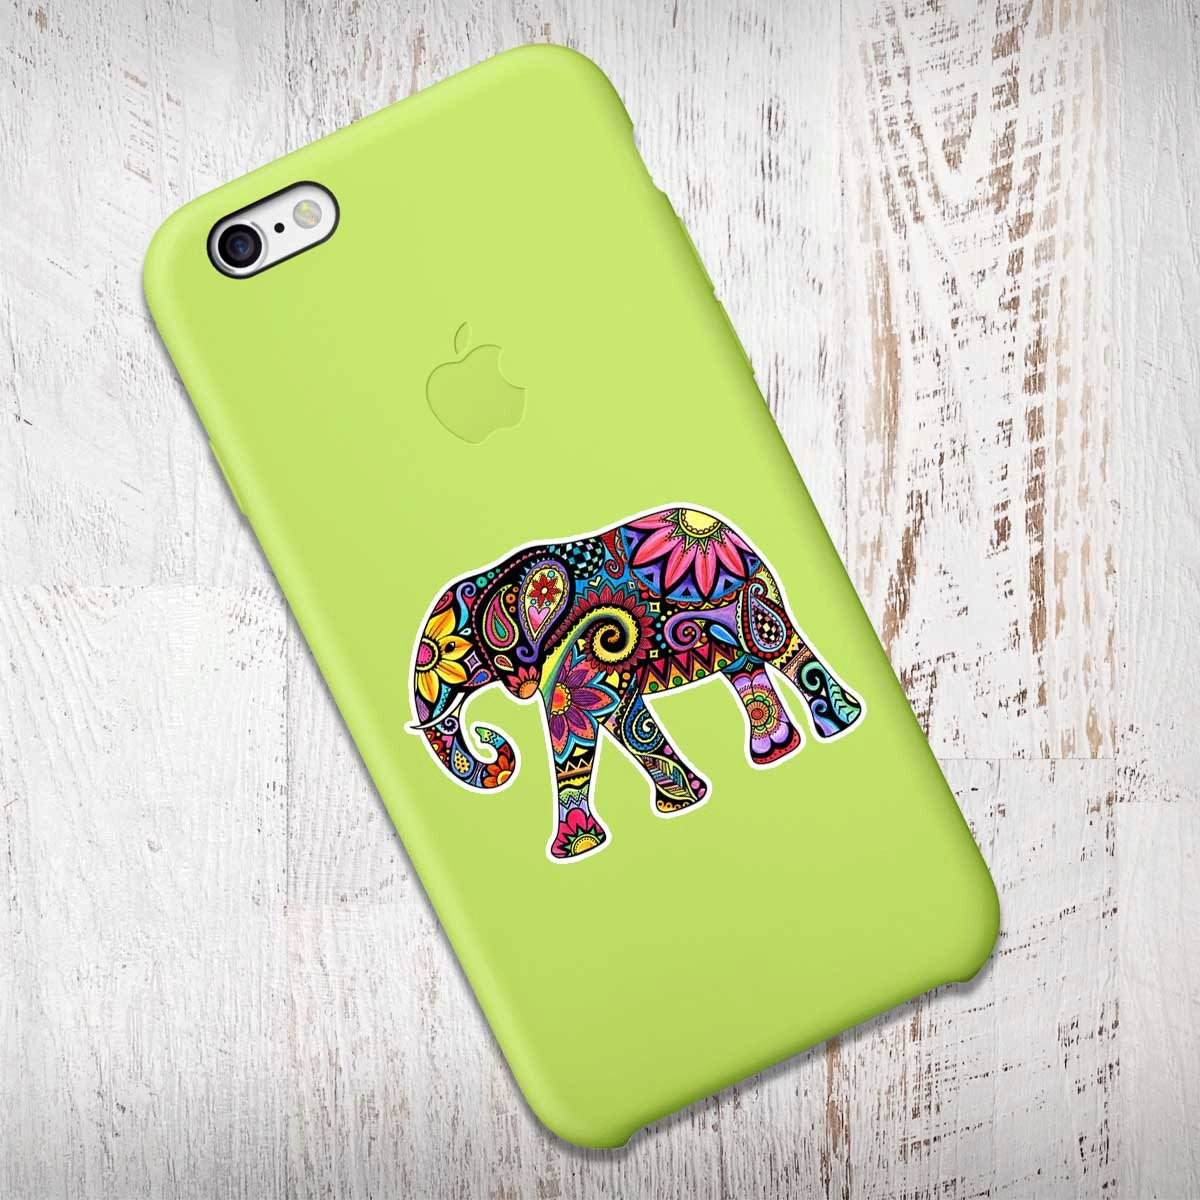 Cute car sticker designs - Mini Elephant Sticker Phone Decal Colorful Laptop Decal Small Elephant Iphone Sticker Jungle Flowers Cute Car Decal Hippie Boho Tribal Art